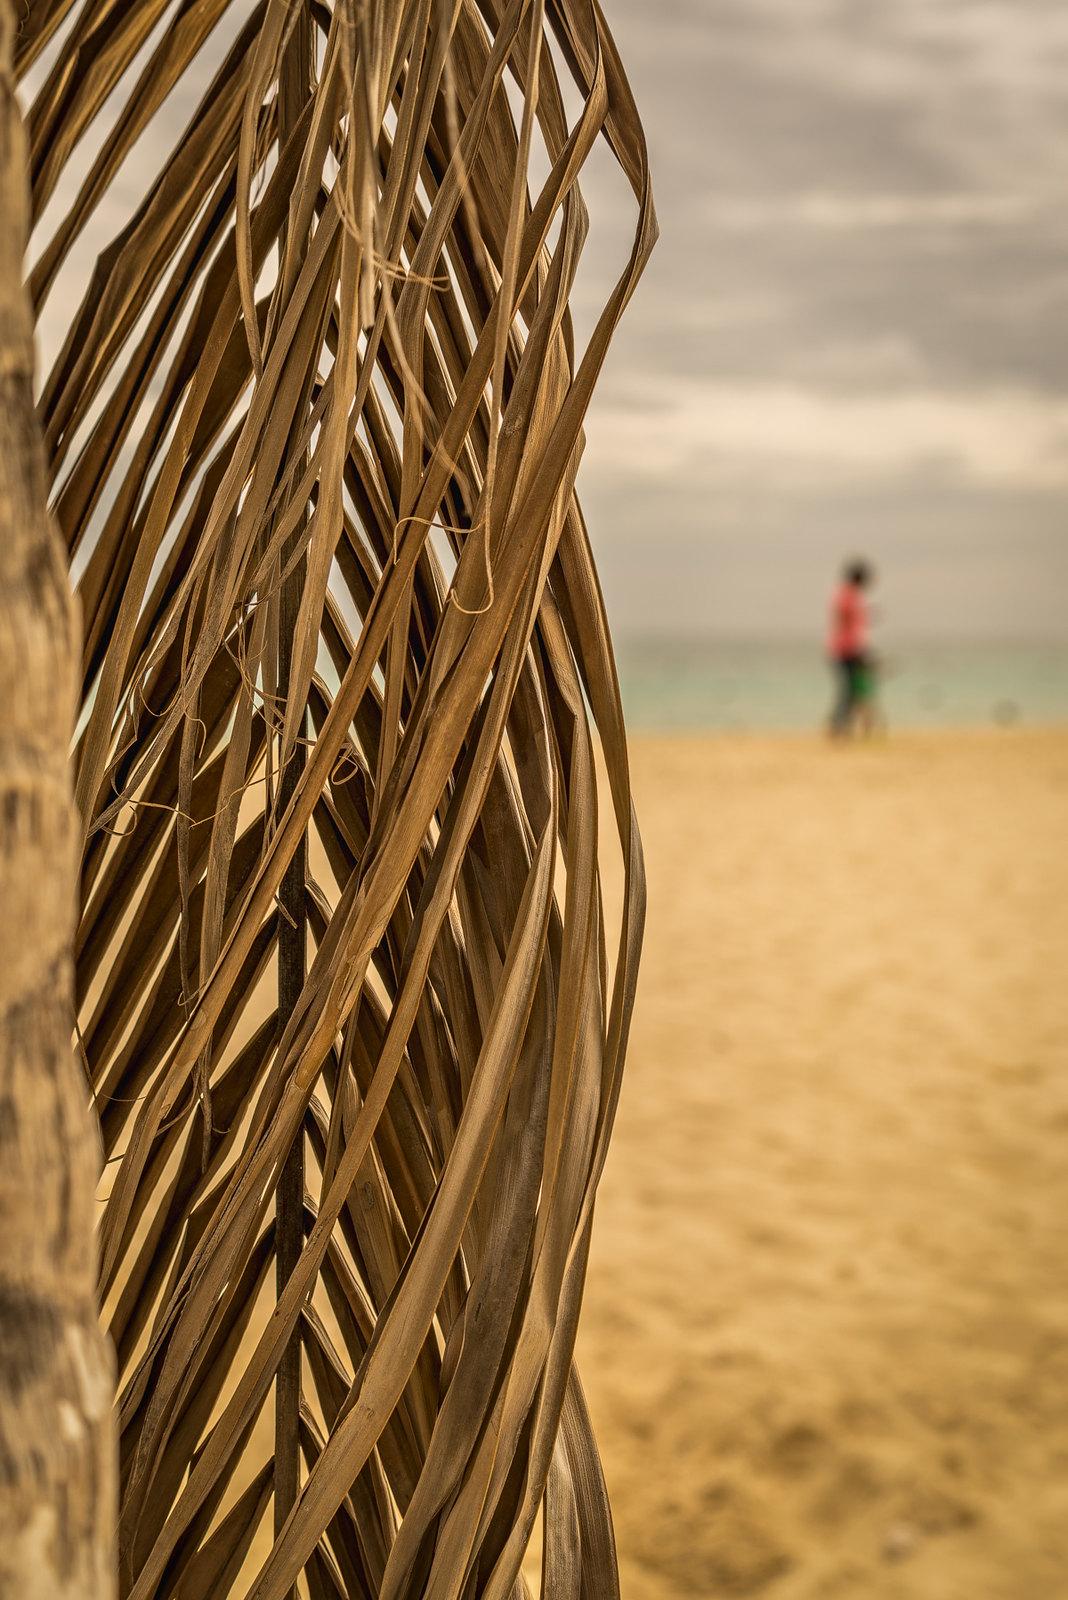 playa del carmen, mexico oct2014